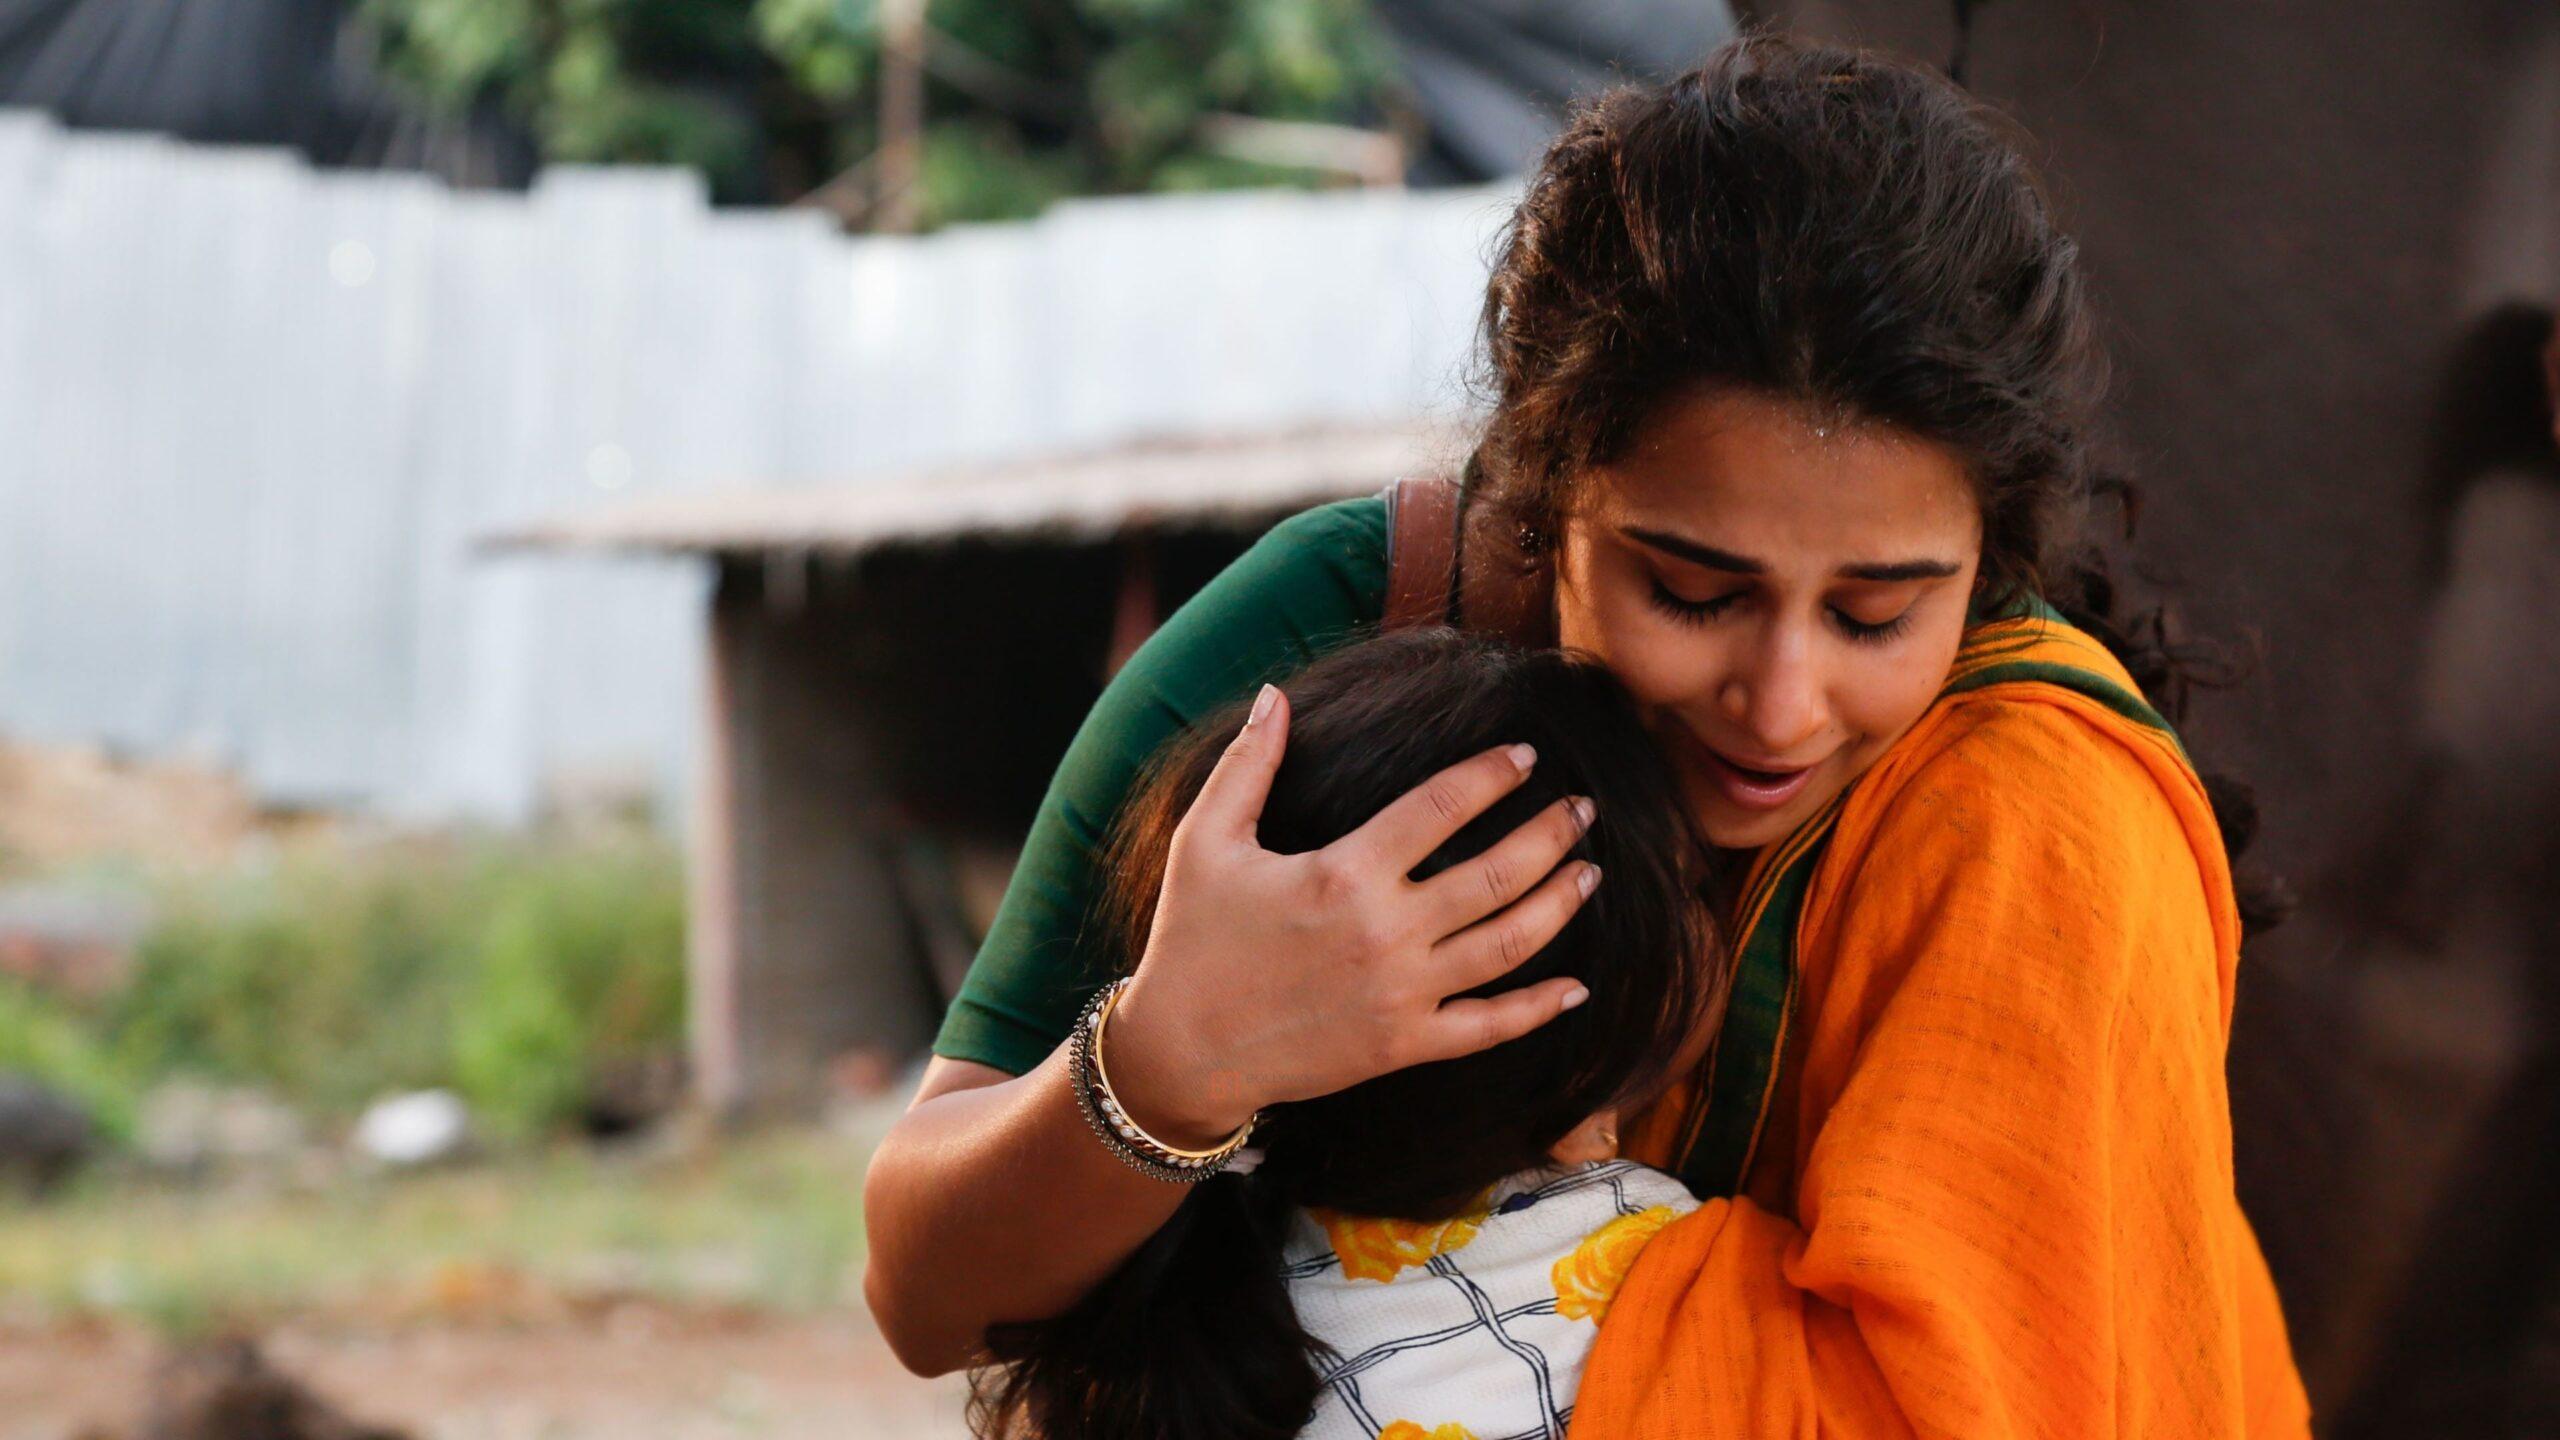 Kahaani 2 Movie Streaming Online Watch on Hungama, Jio Cinema, Zee5